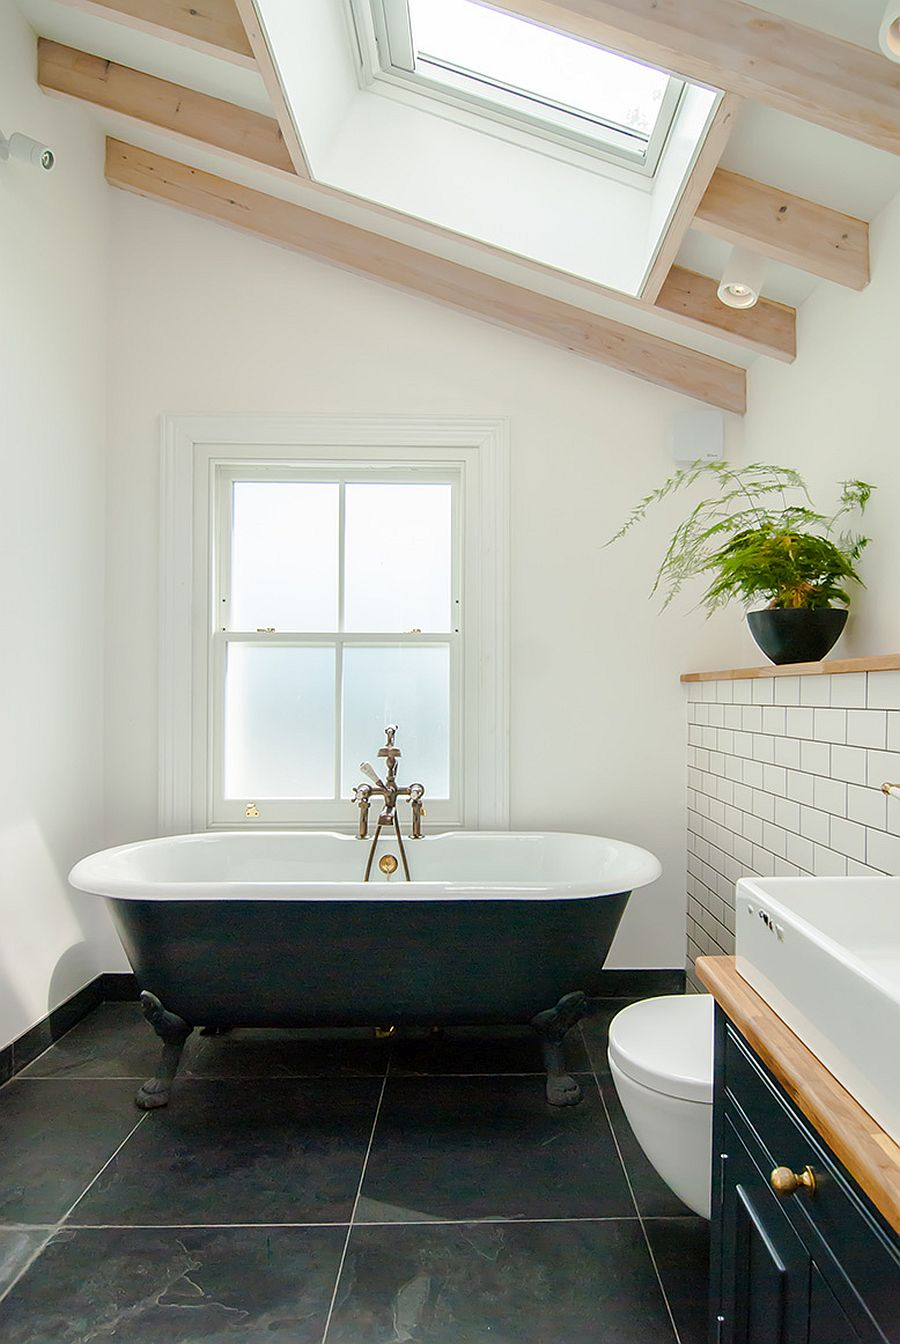 Clawfoot-bathtub-inside-the-renovated-modern-bathroom-in-white-and-black-46405